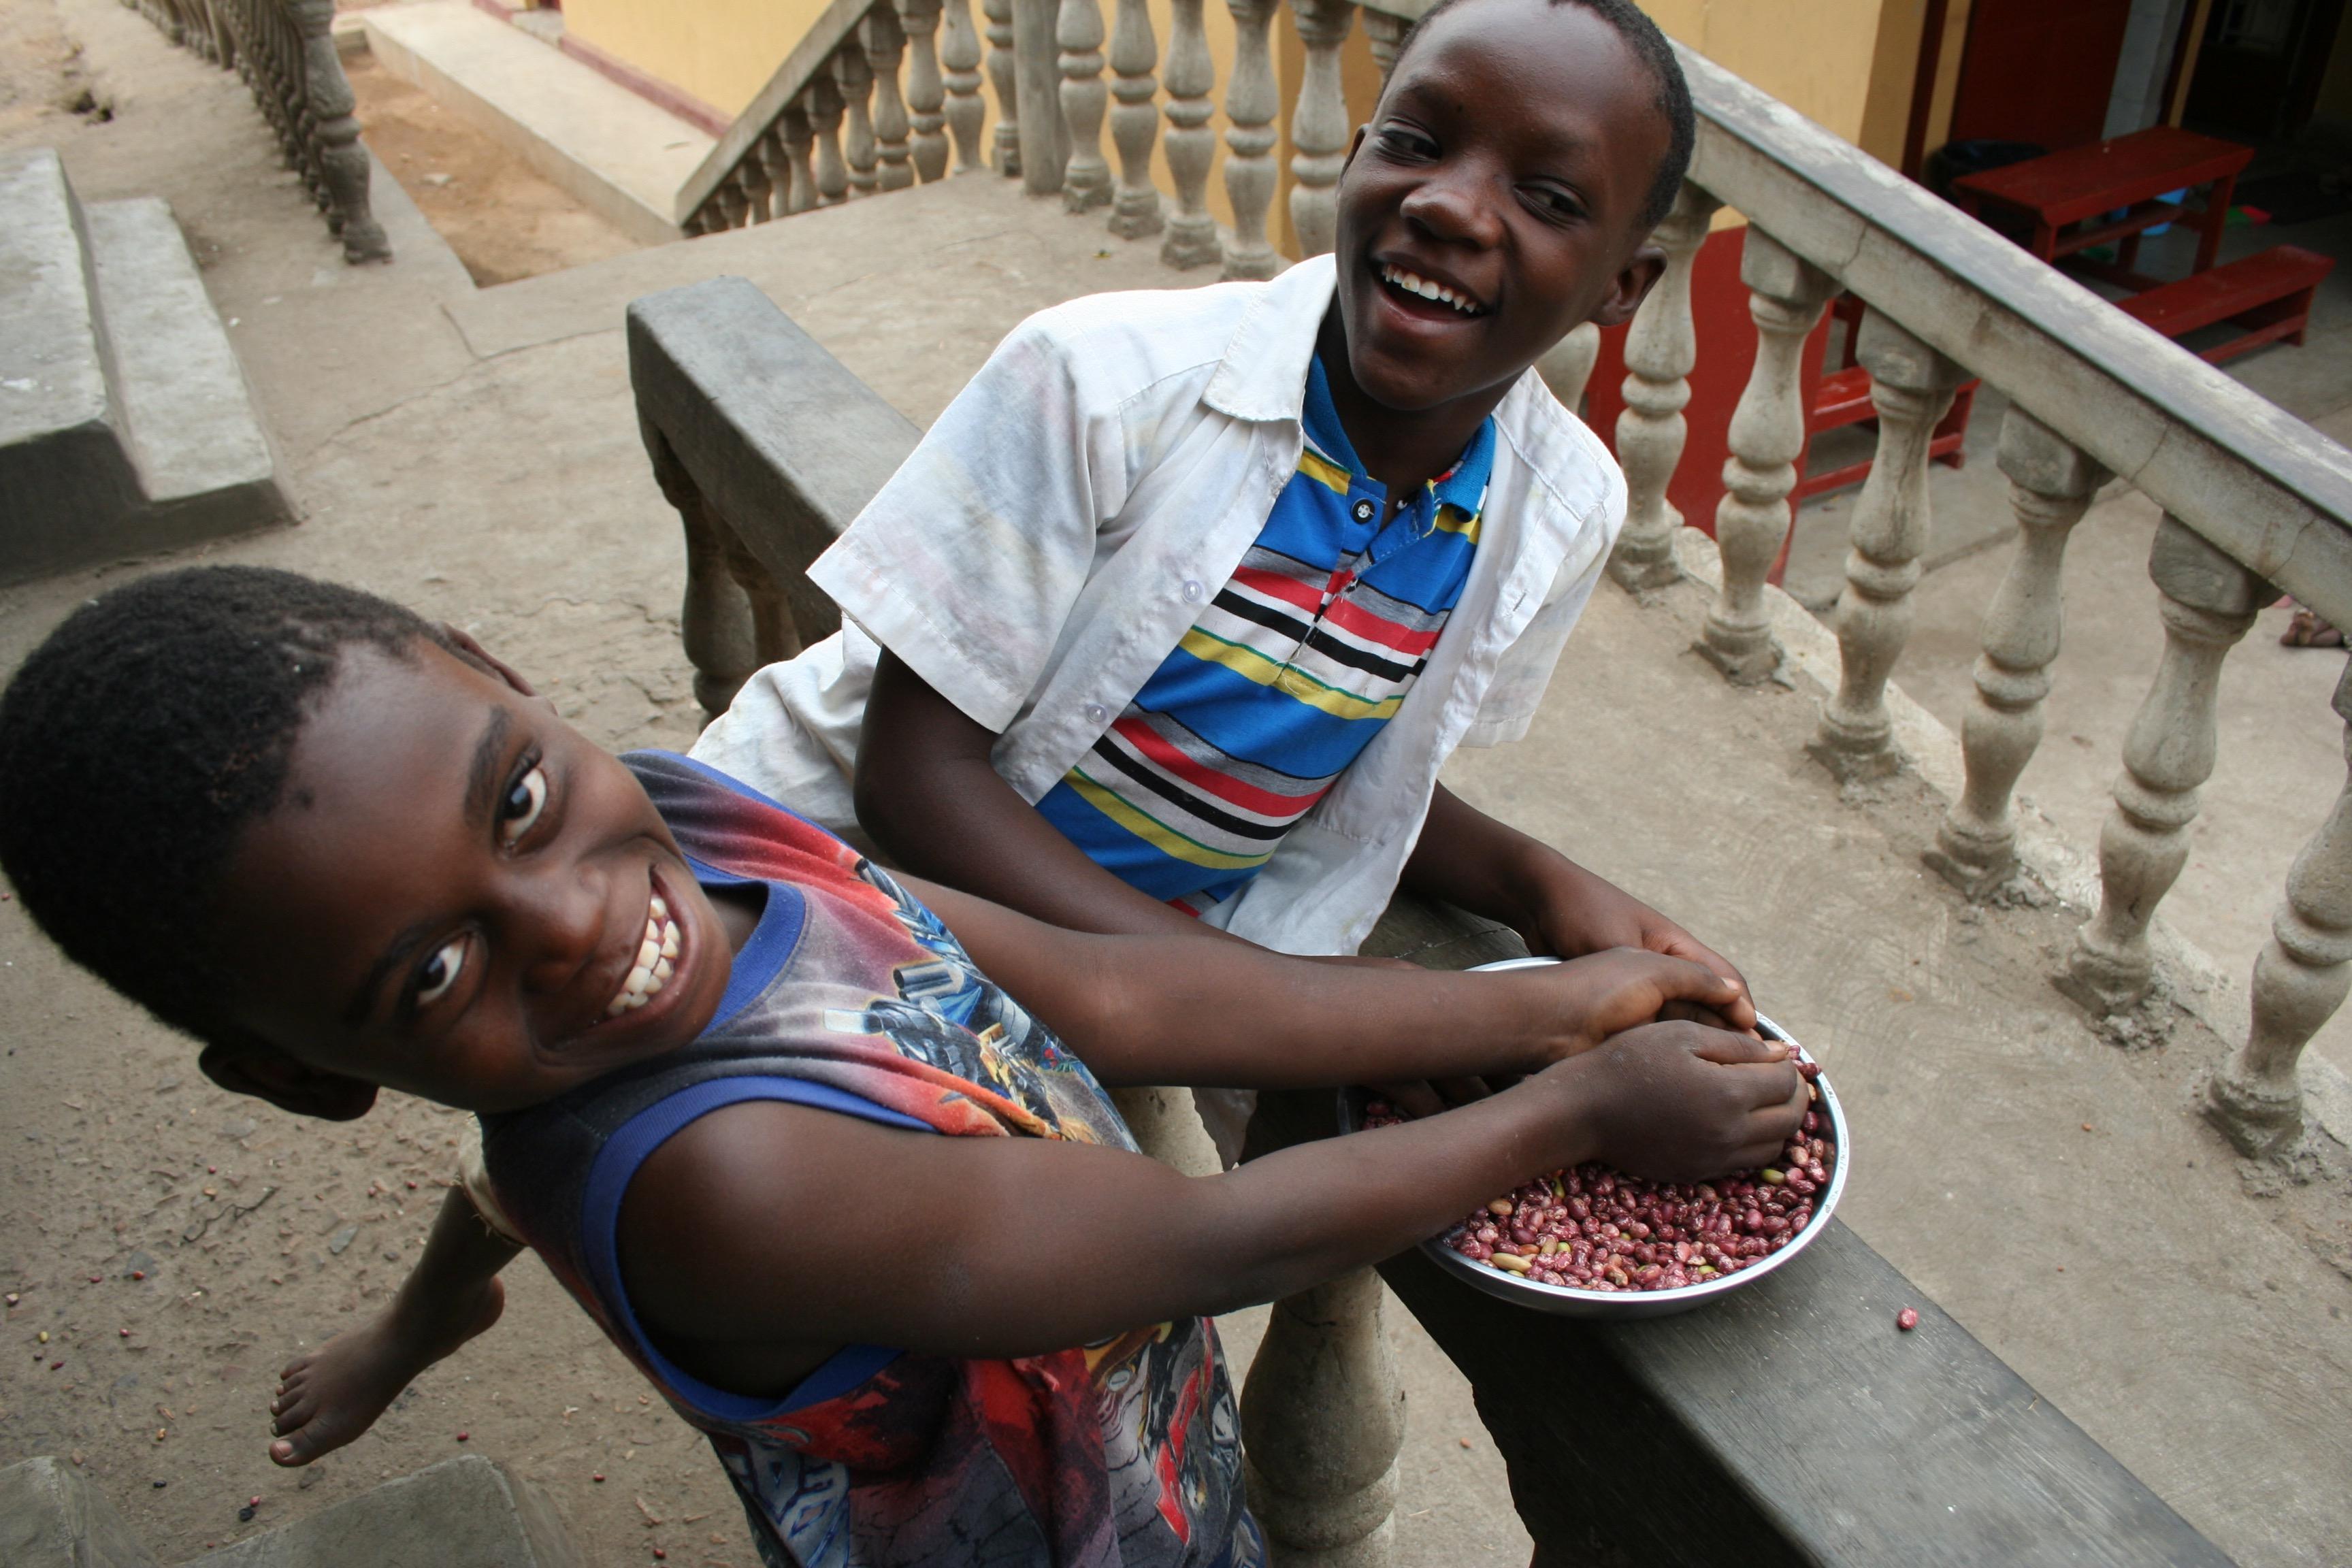 2 Ugandan boys smiling with food